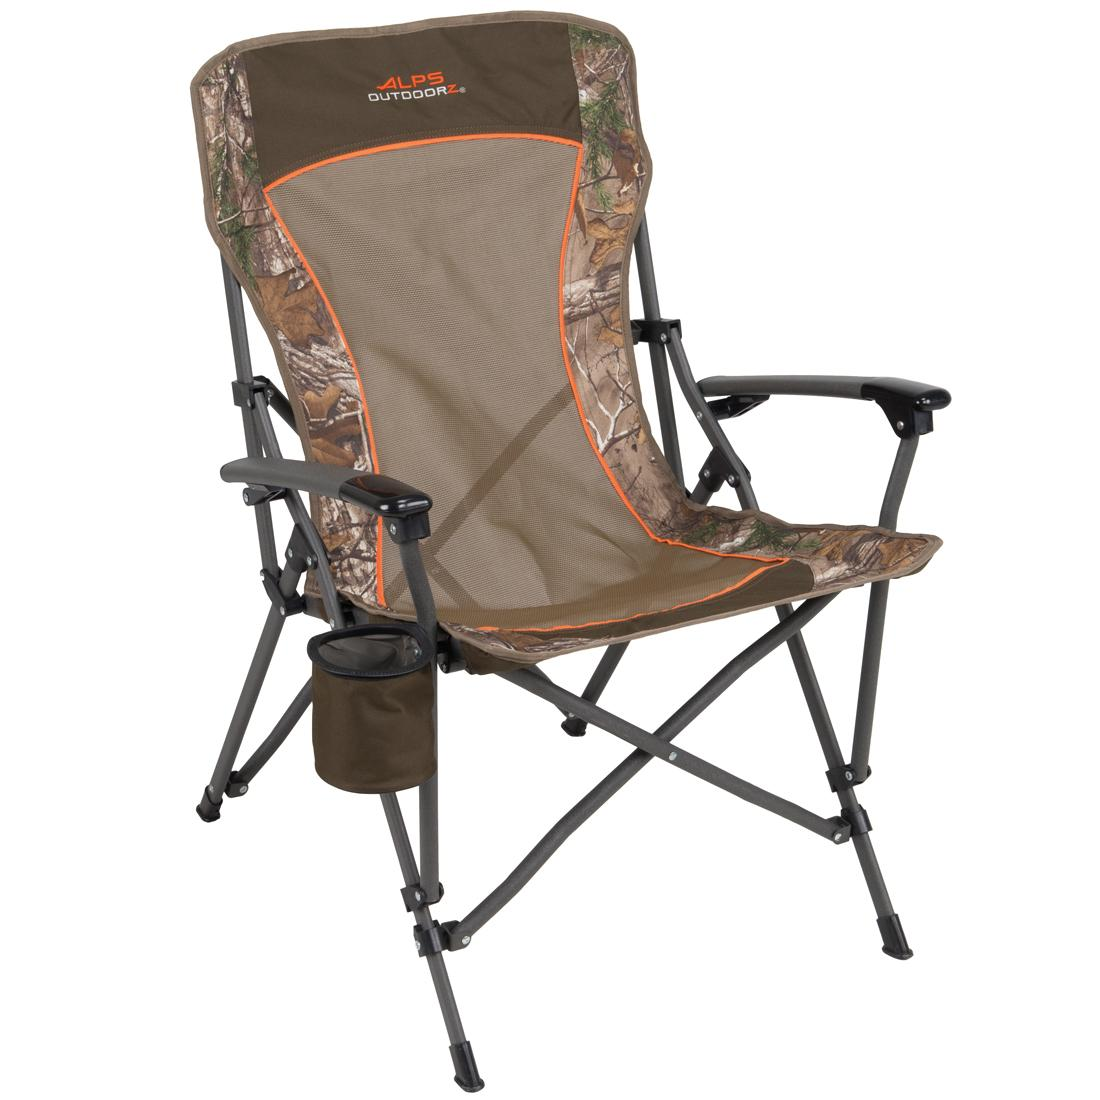 Amazon Com Alps Outdoorz 8411015 King Kong Chair